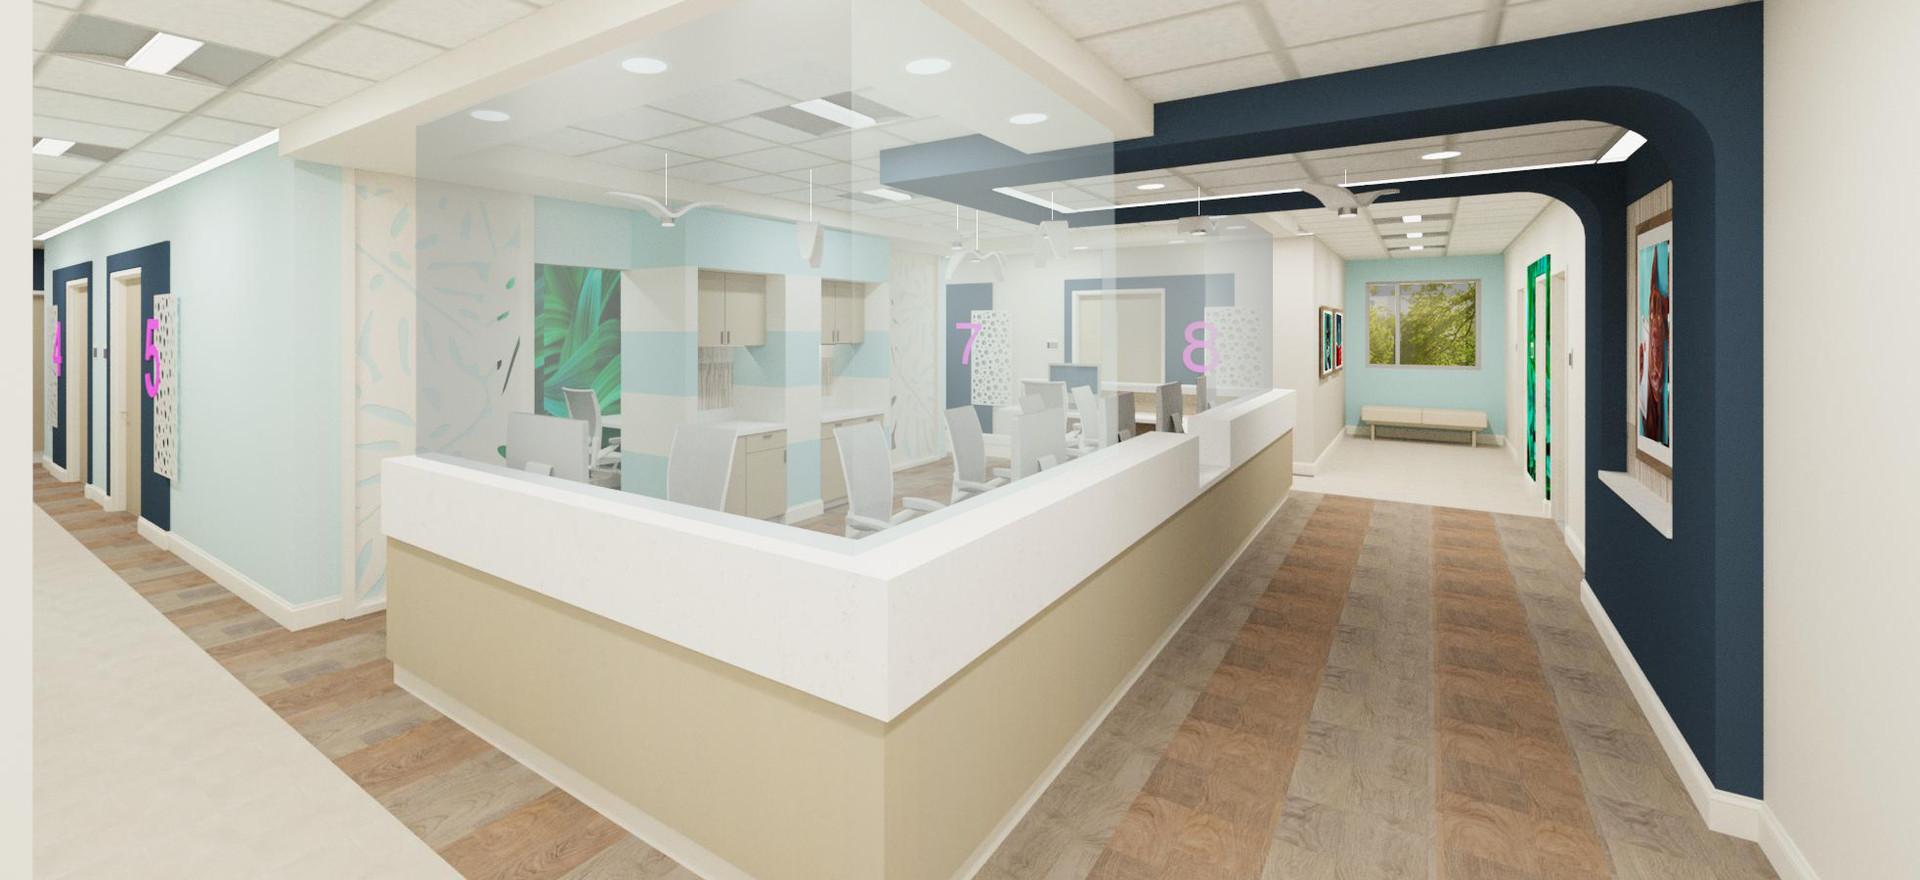 Nocatee Pediatric Clinic & Rehab